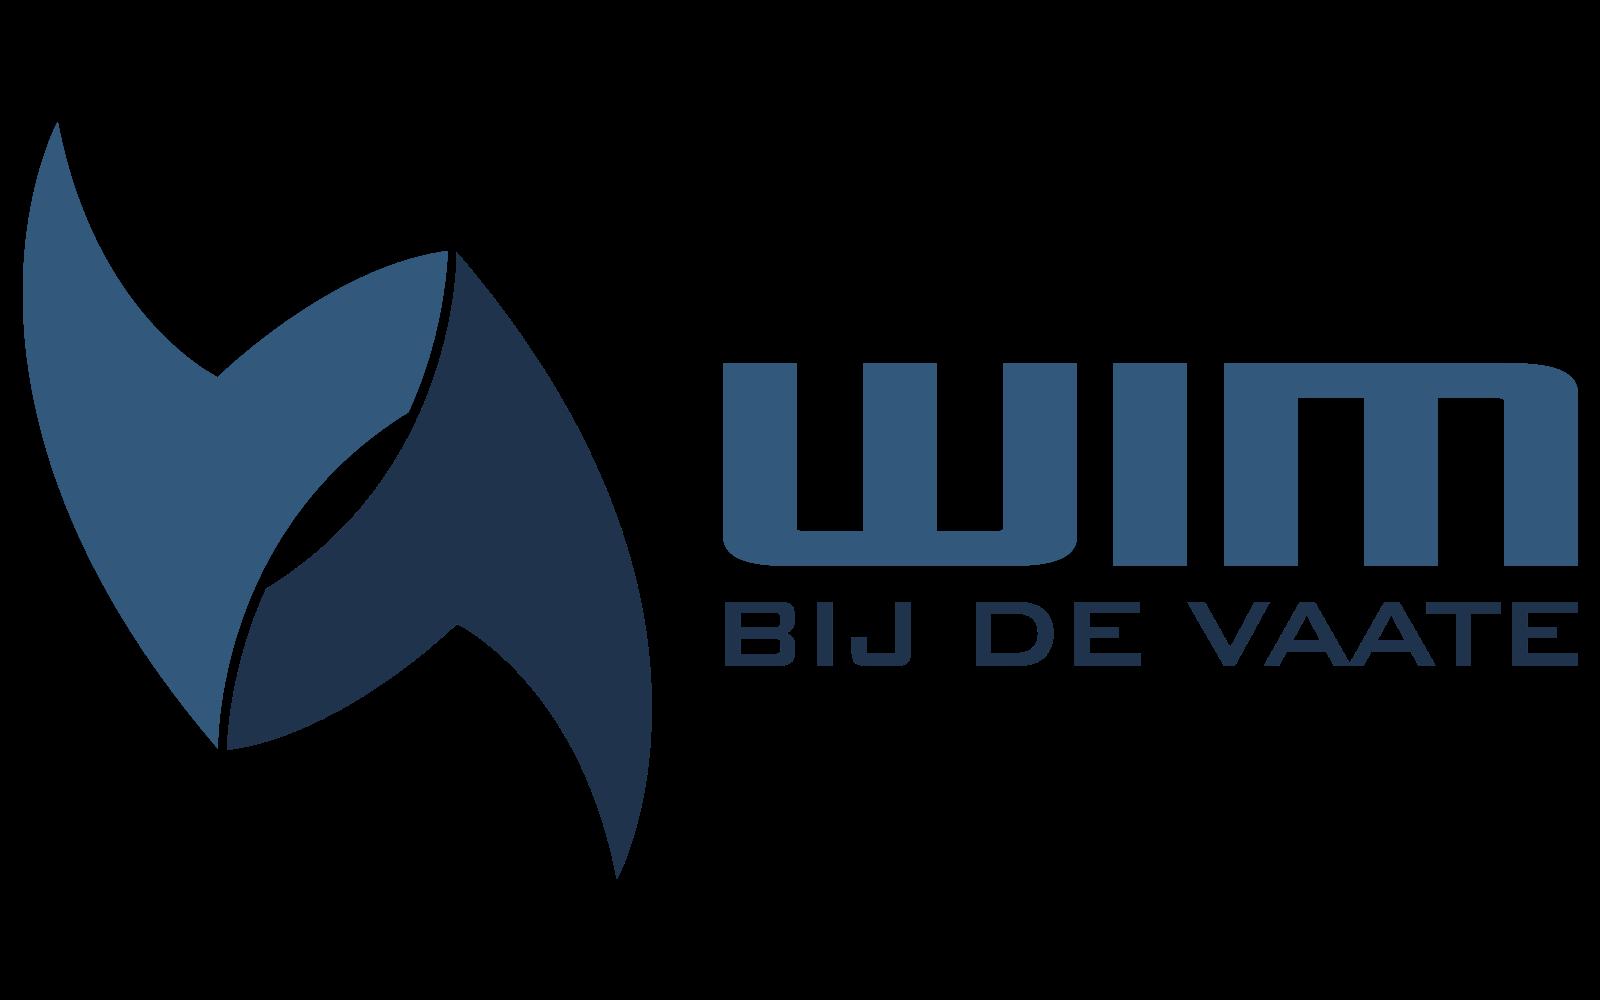 pf-logo-wbdv-2